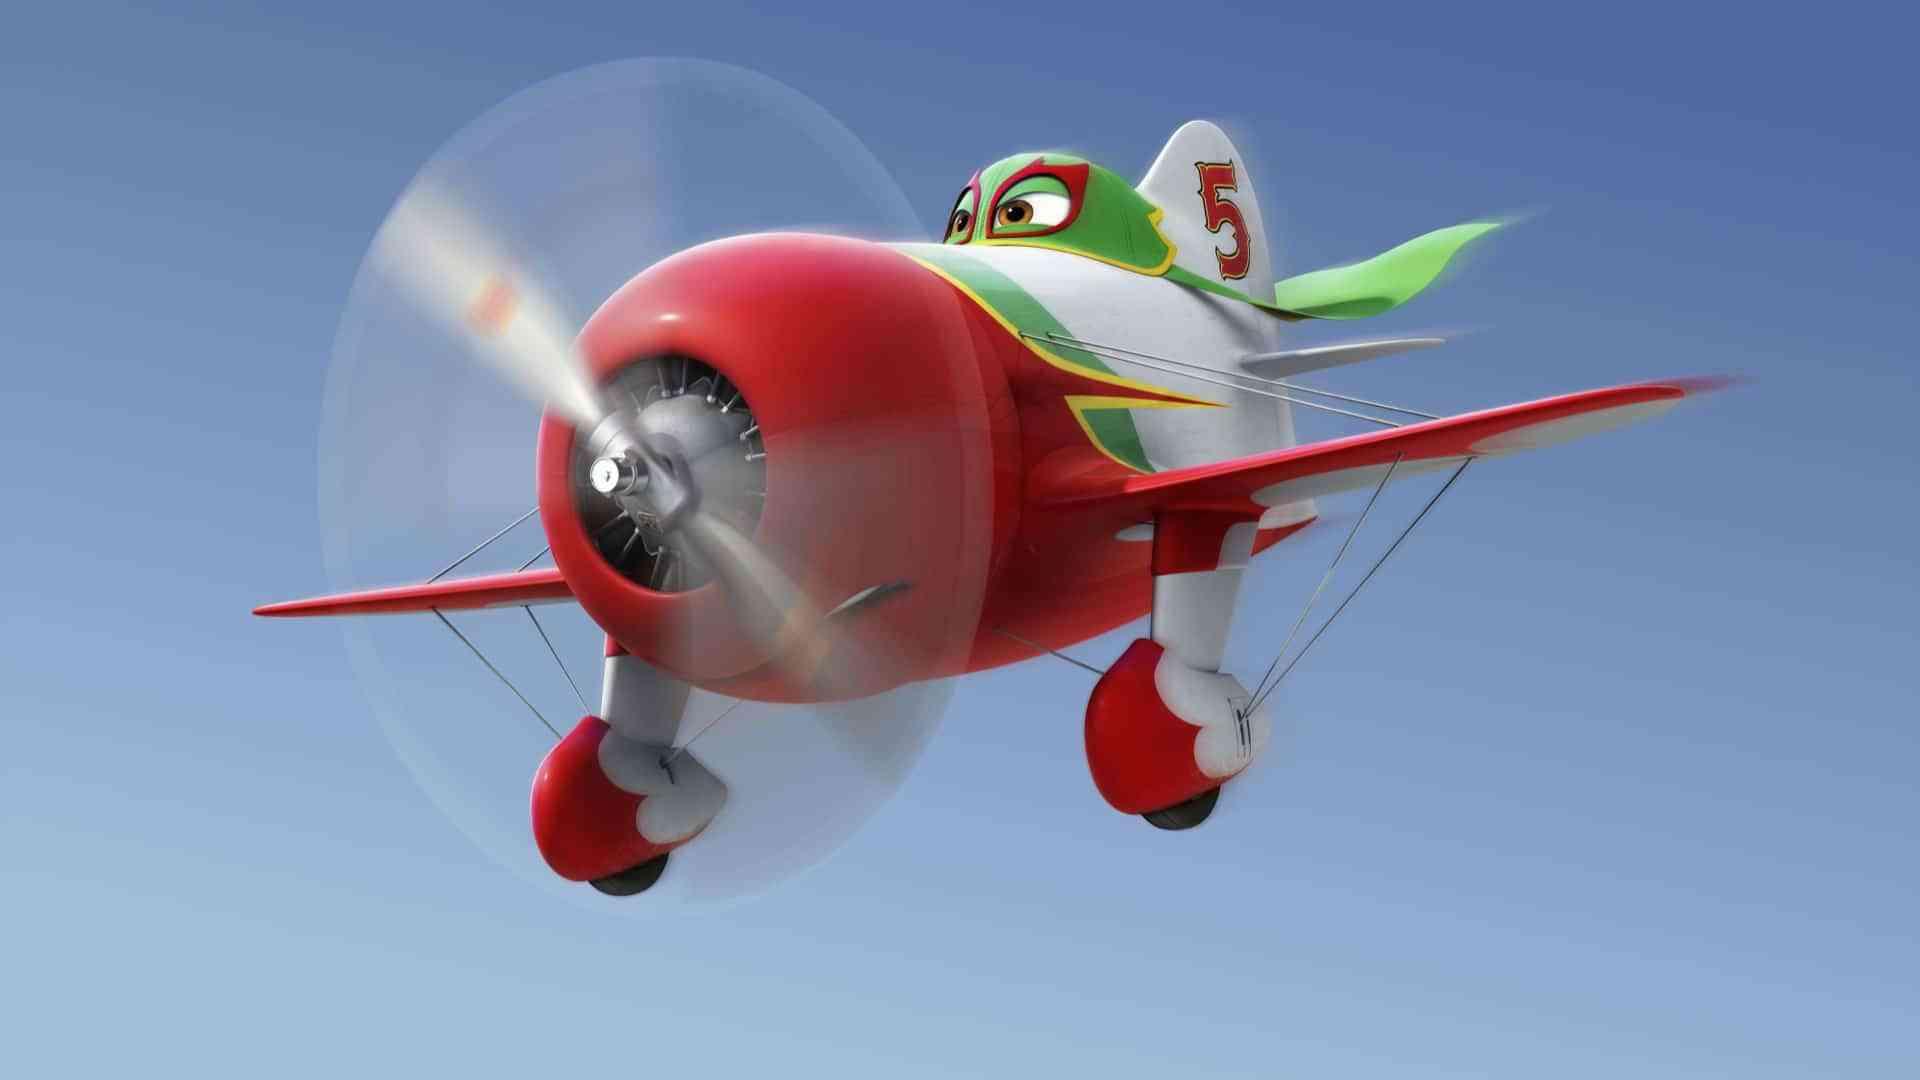 Canadian Online Gamers 187 Disney Planes Wii U Review Flying The Friendly Skies